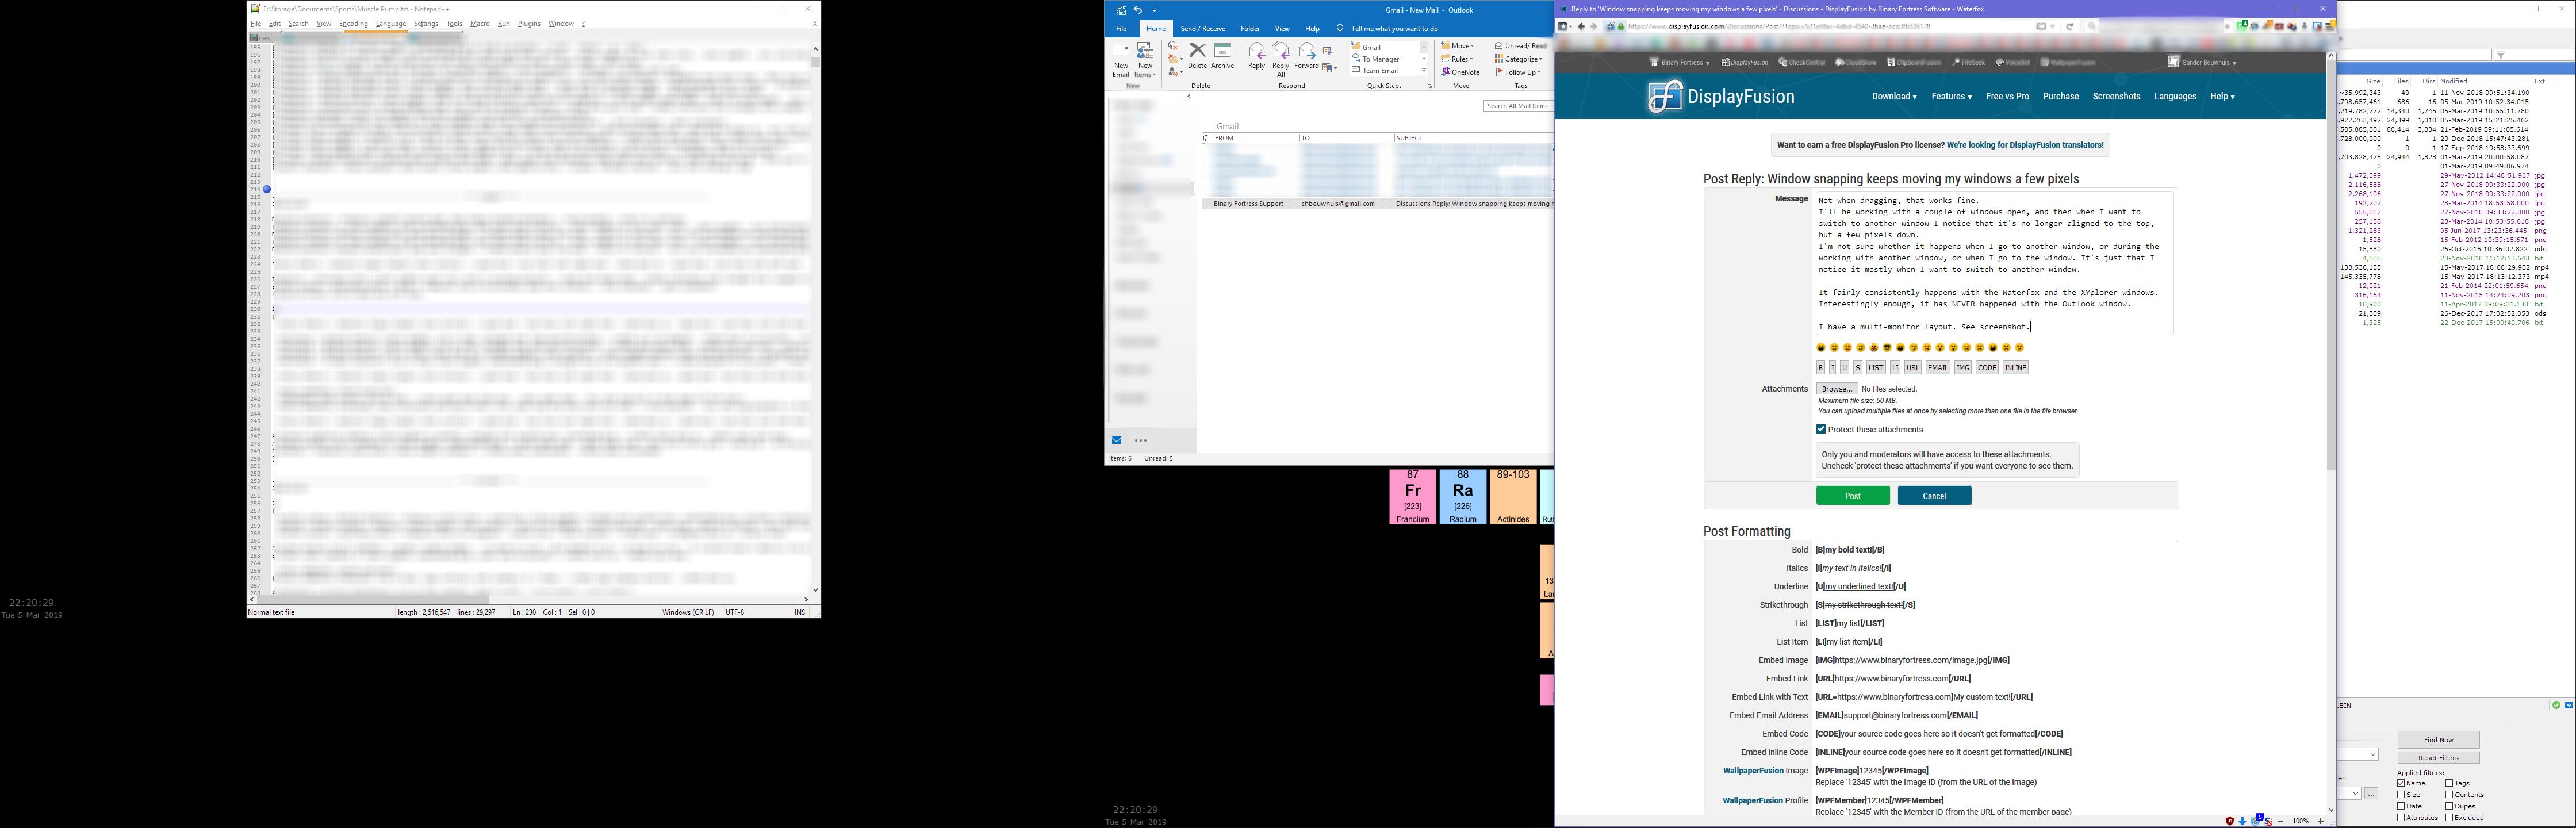 Desktop both monitors.png